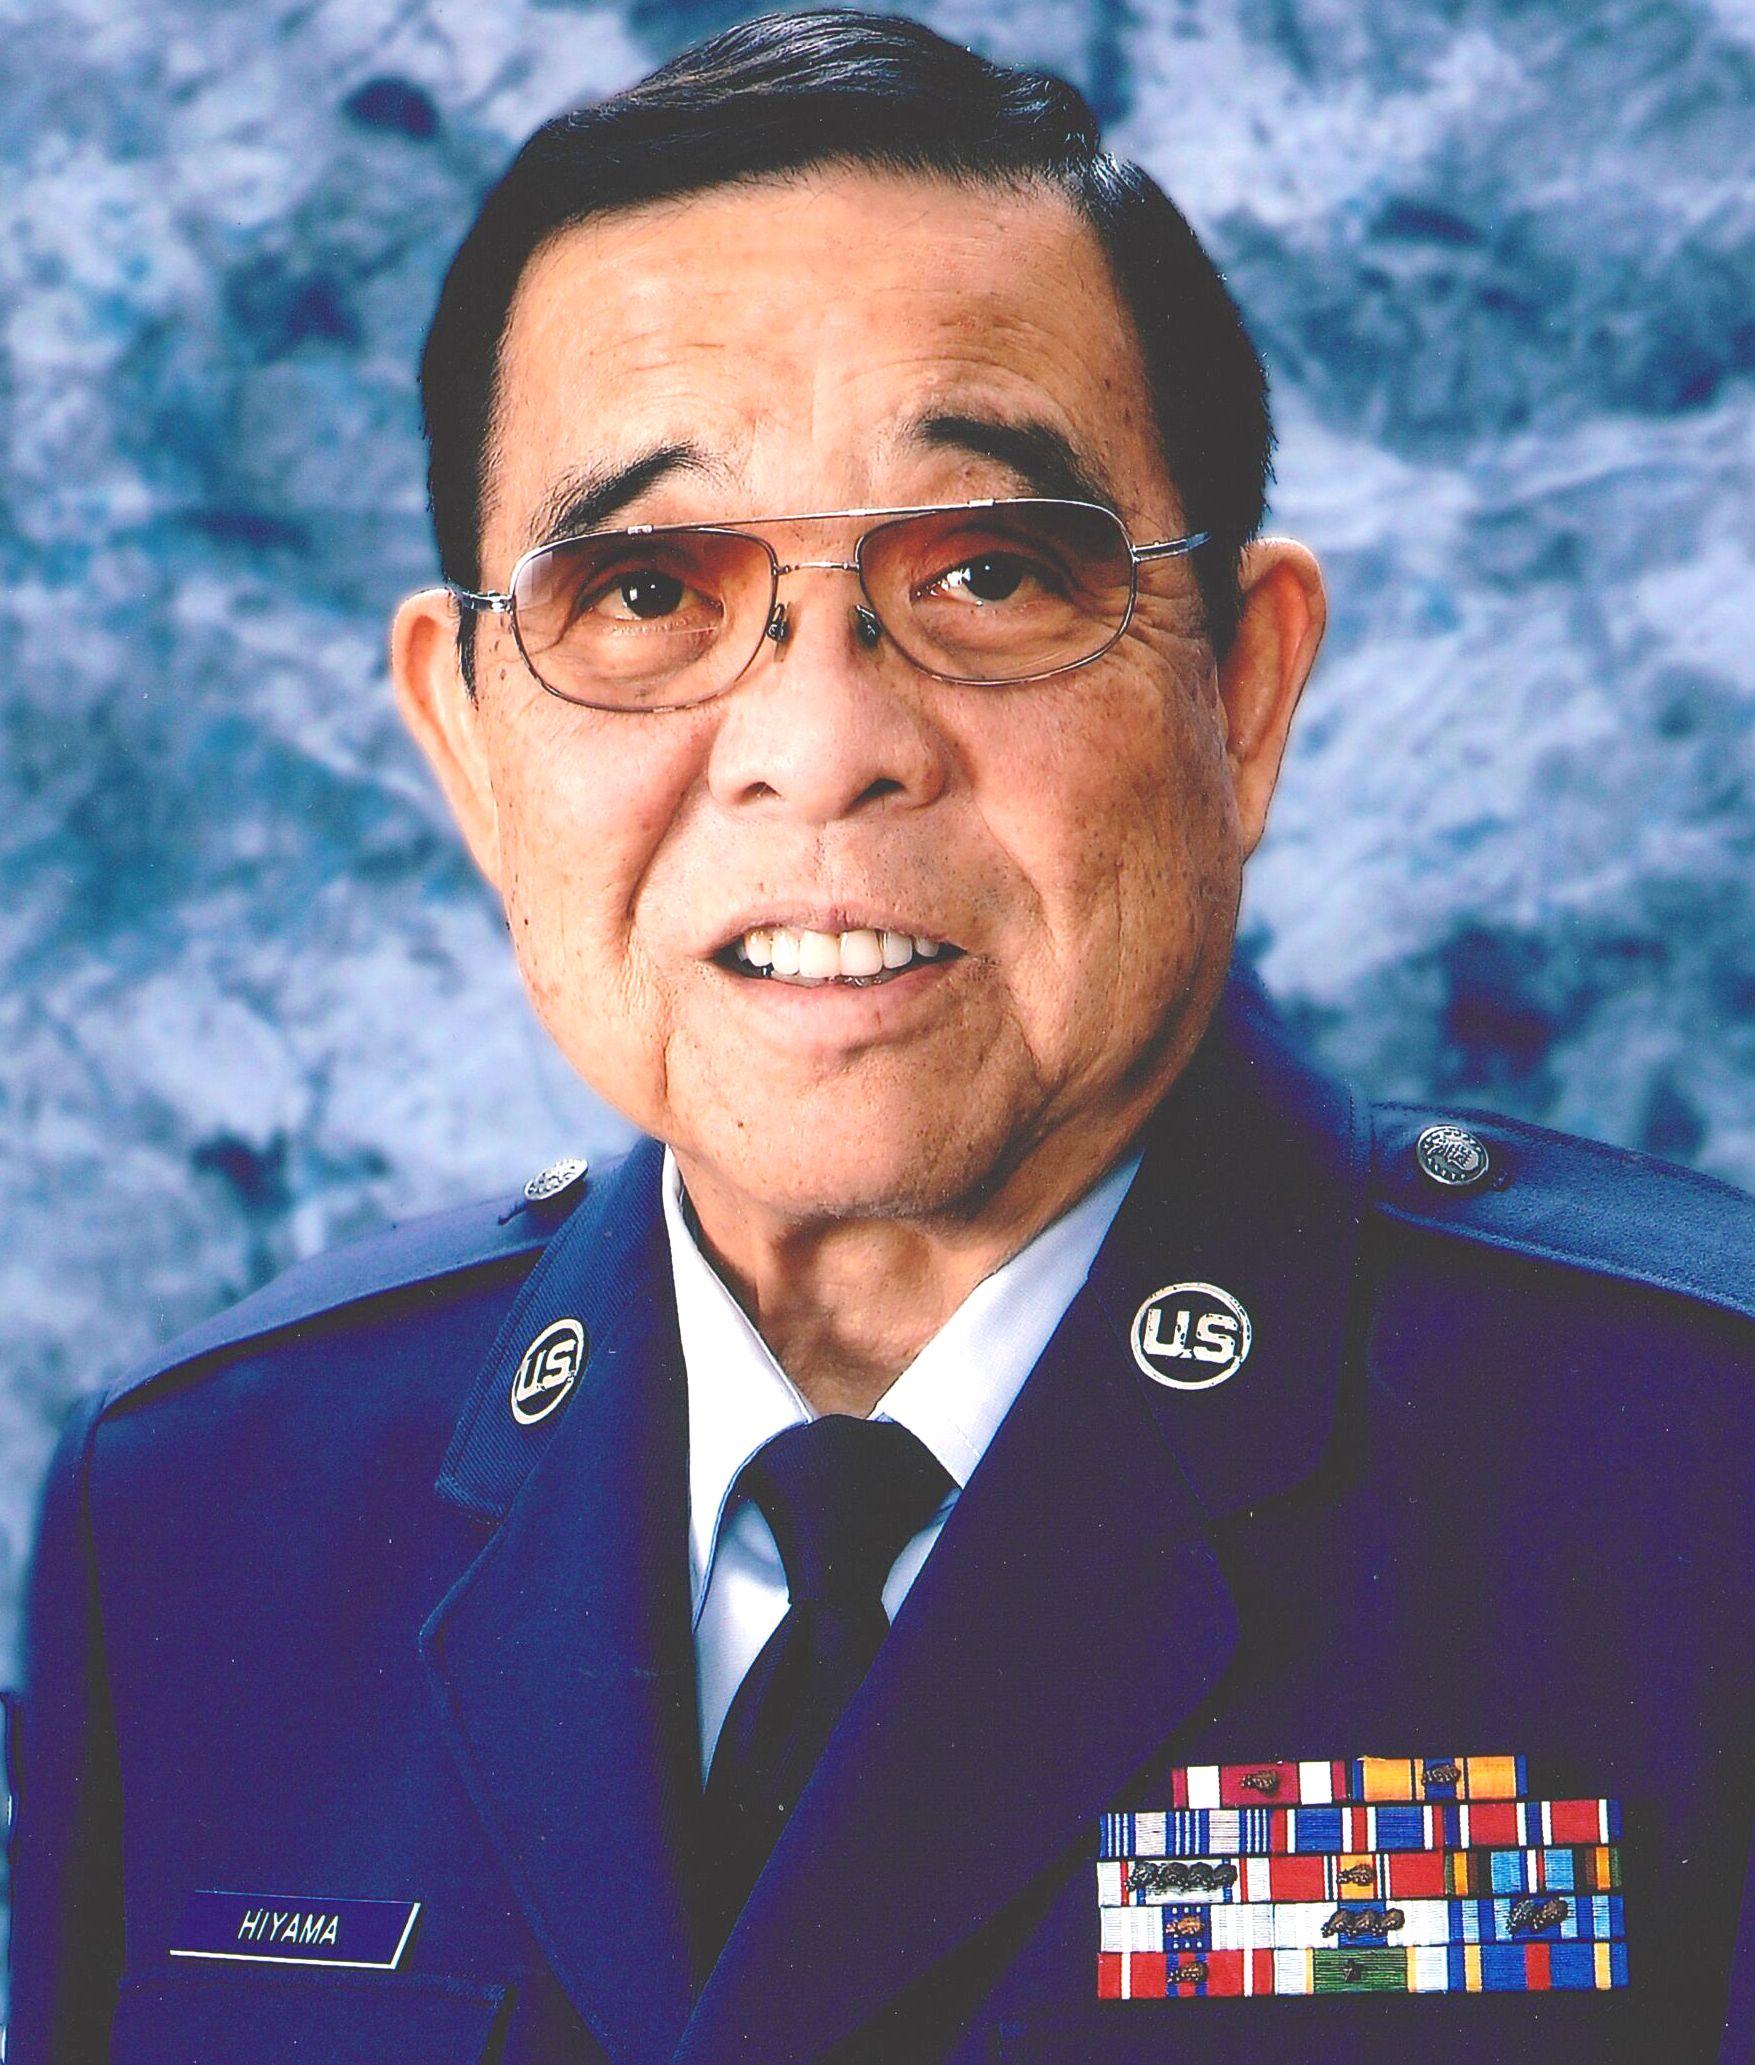 CMSgt Duke T. Hiyama